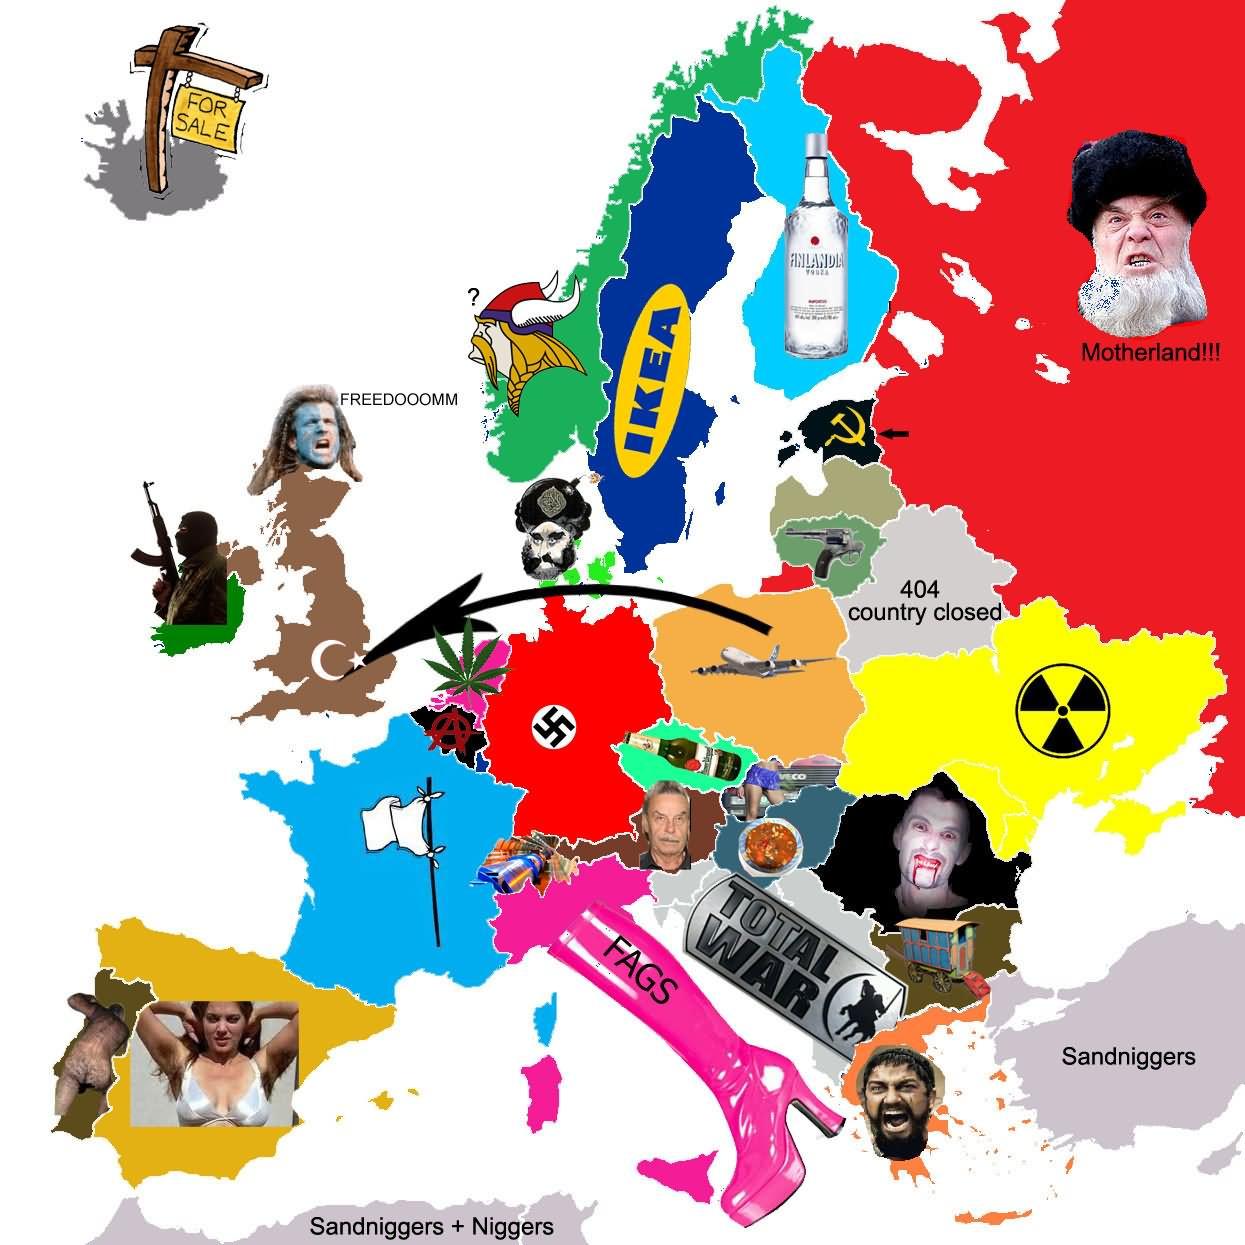 Funny Europe Total War Image